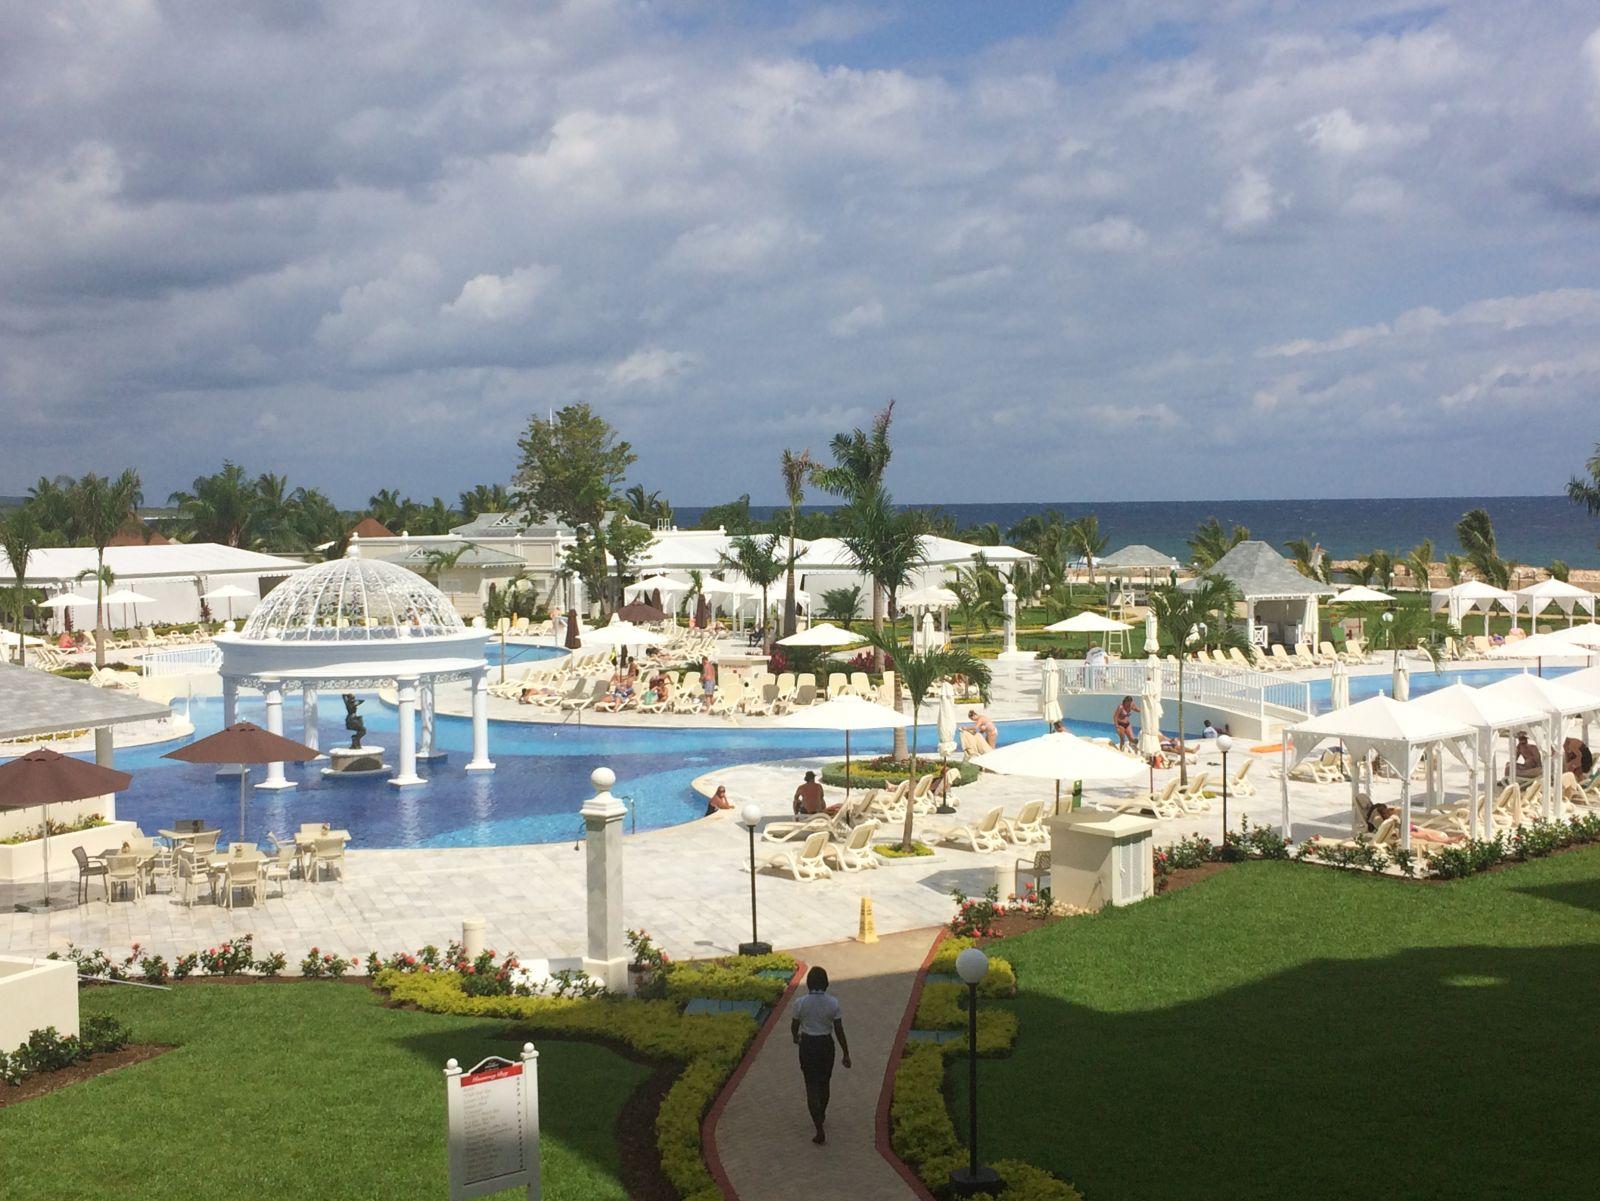 Pool Area GBP